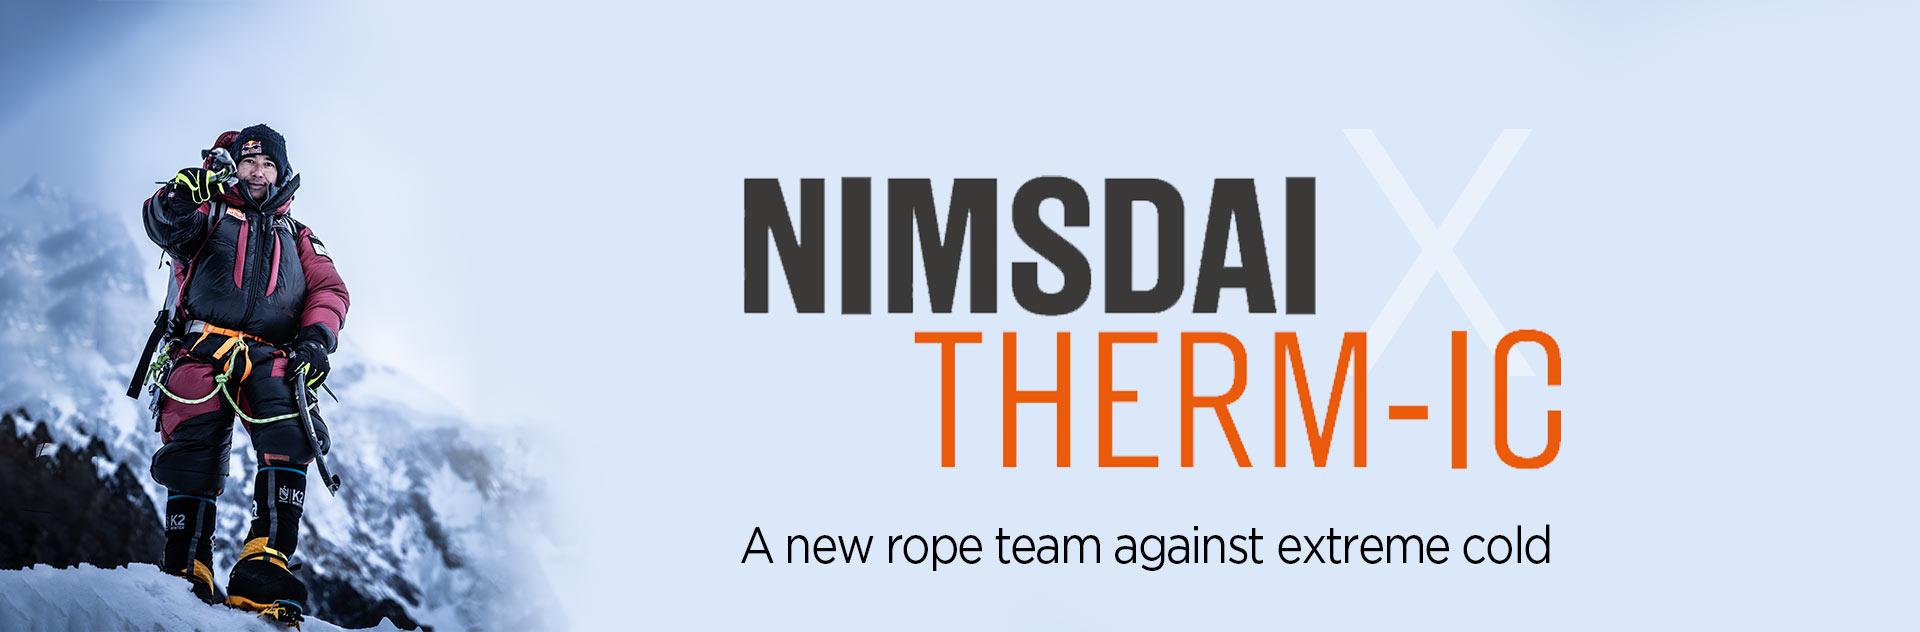 Nimsdai, Nirmal Purja, a new rope team against extreme cold